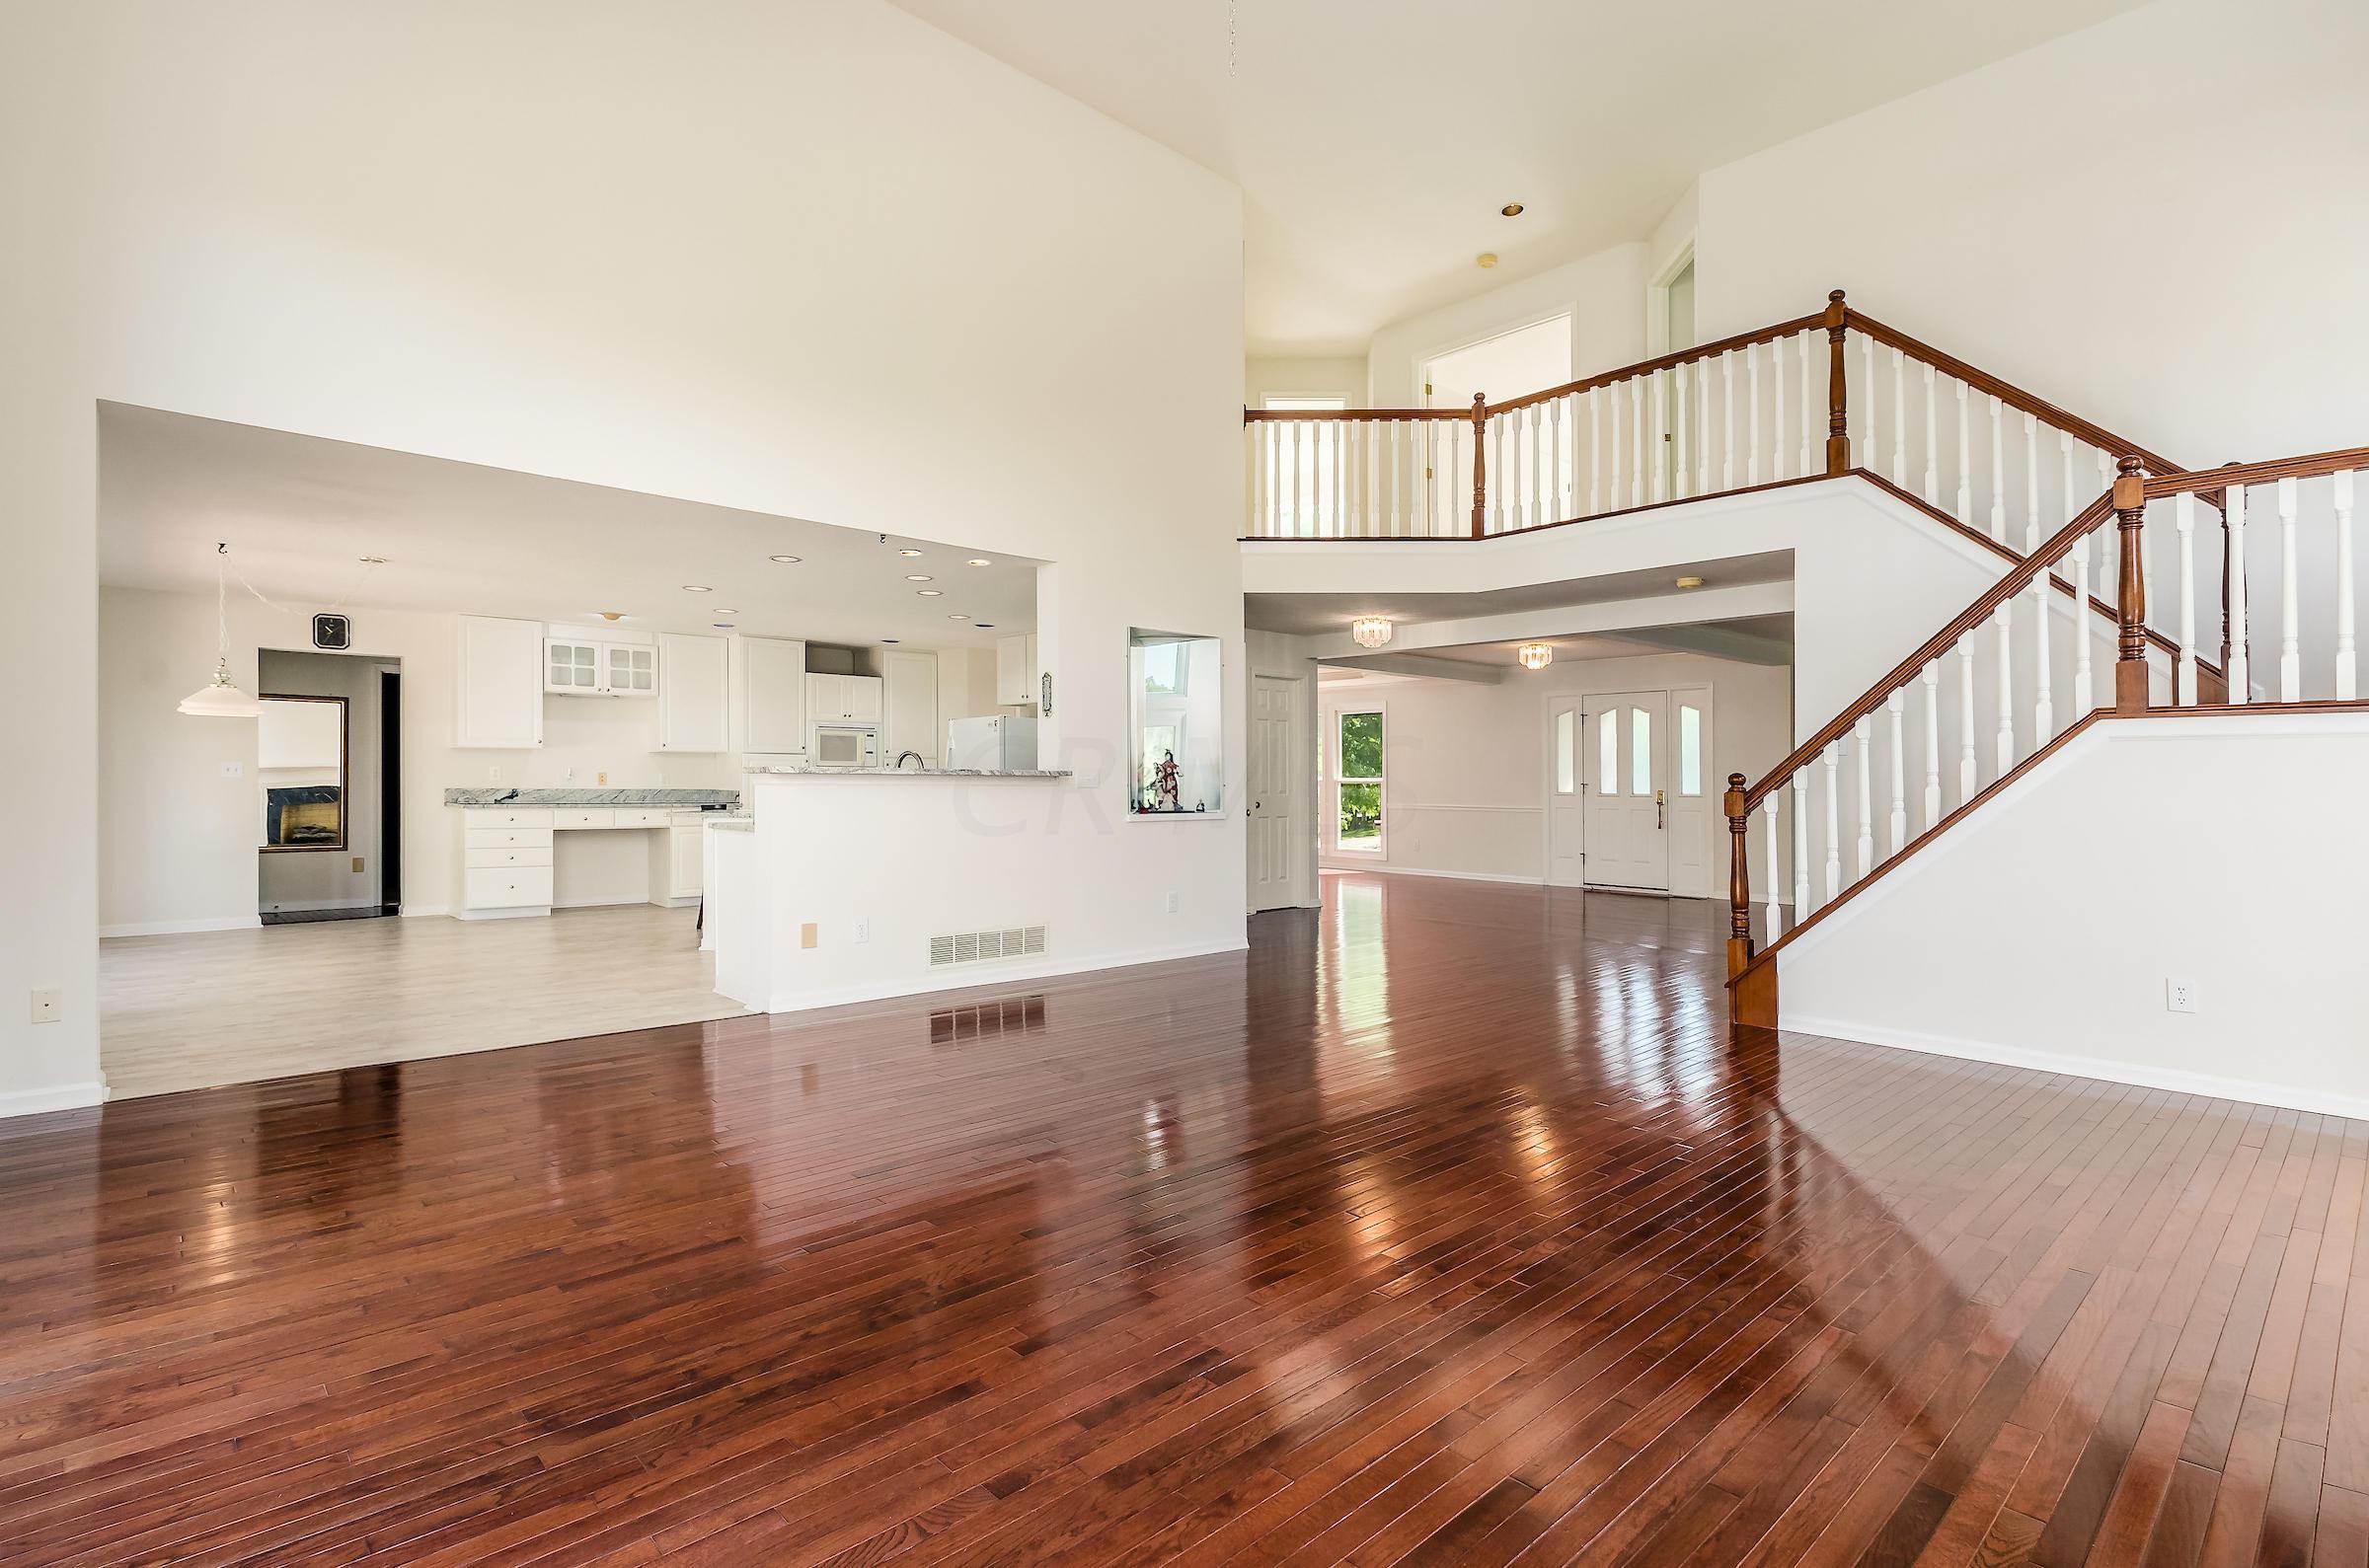 10848 Buckingham Place, Powell, Ohio 43065, 5 Bedrooms Bedrooms, ,4 BathroomsBathrooms,Residential,For Sale,Buckingham,220020602